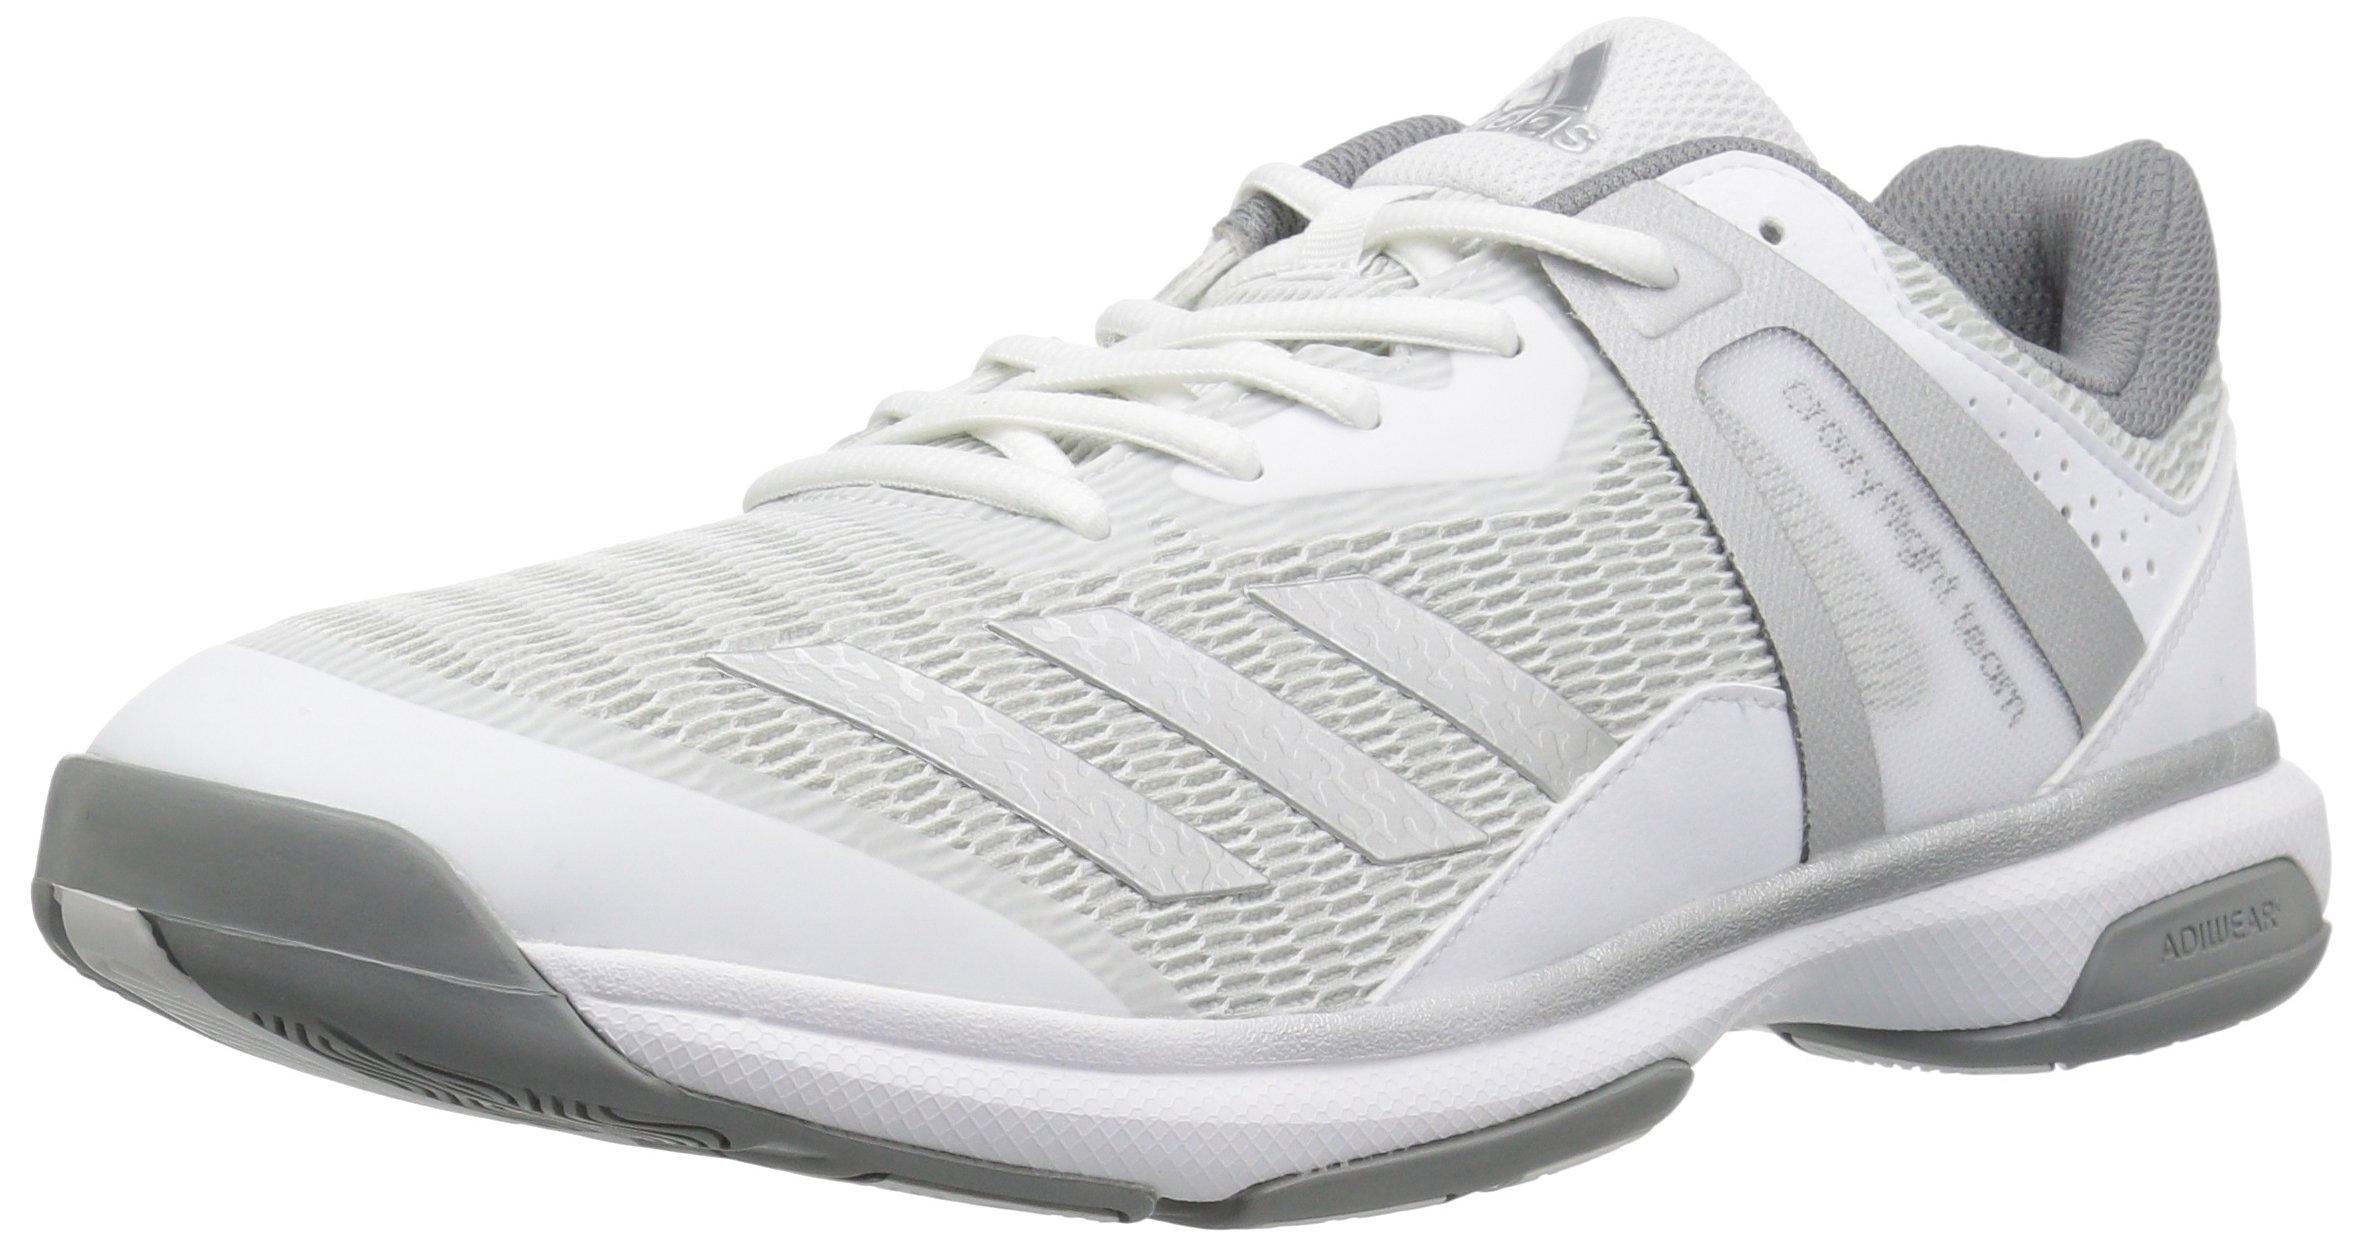 adidas Women's Shoes   Crazyflight Team Volleyball, White/Metallic Silver/Grey Three, (7 M US)